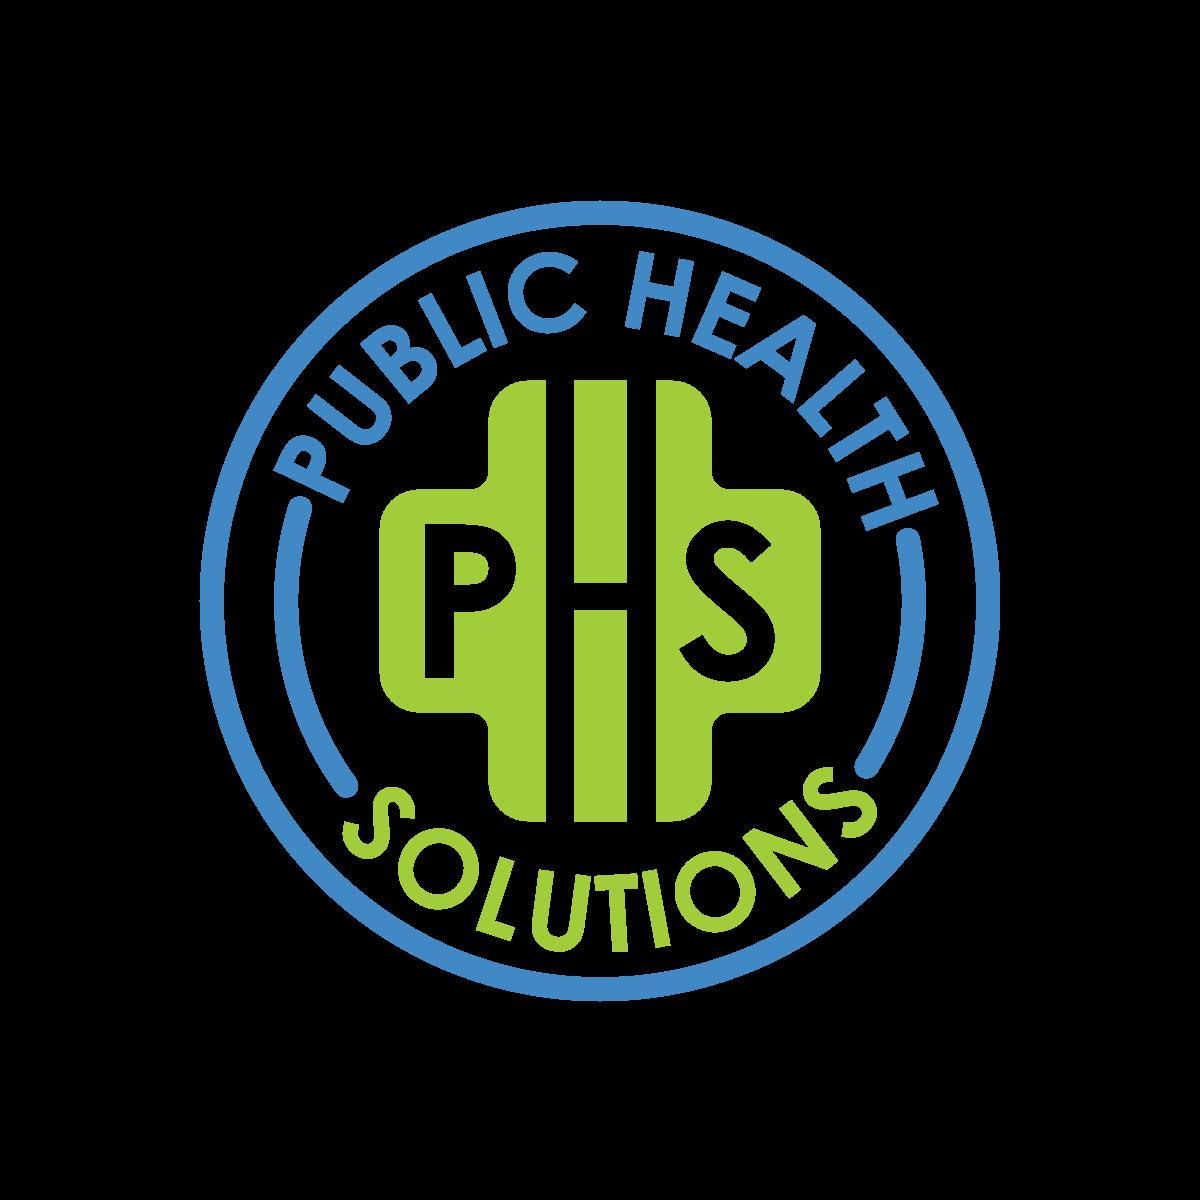 Public Health Solutions (PHS)